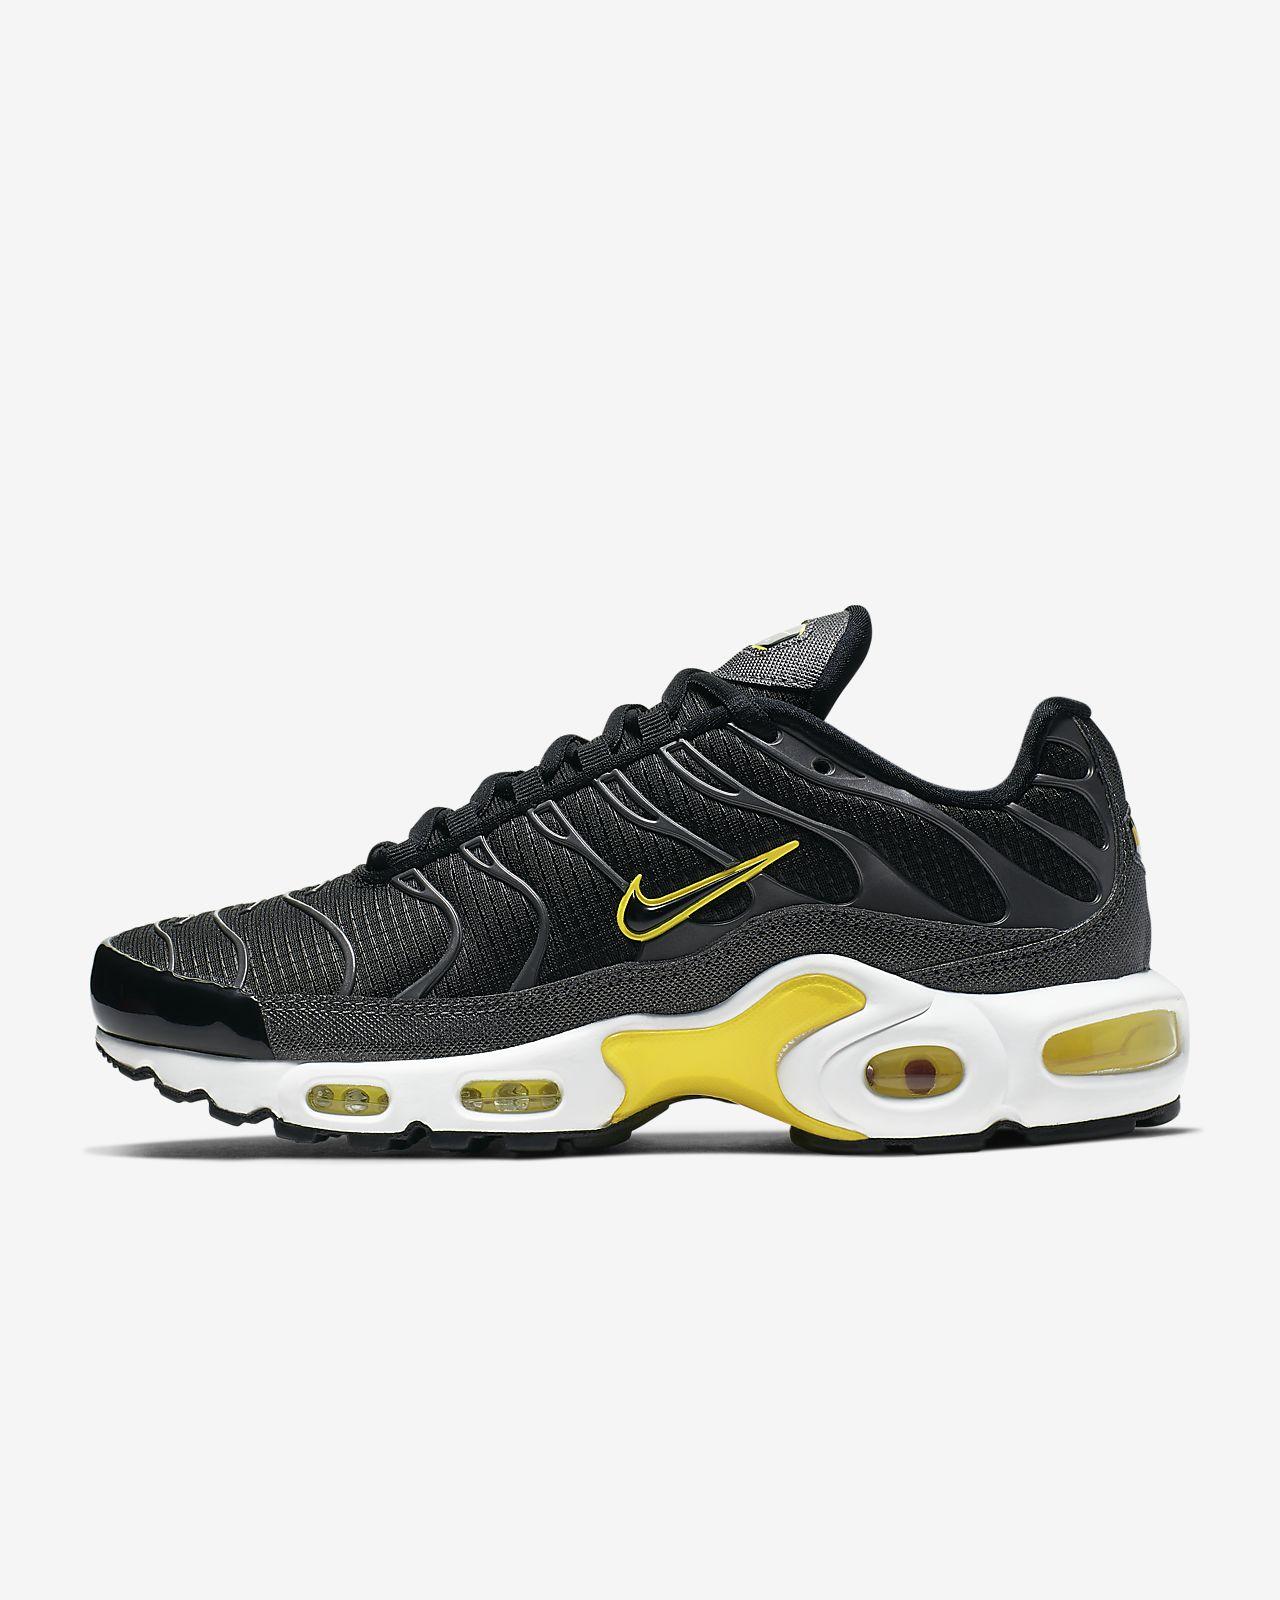 scarpe nike donna 37.5